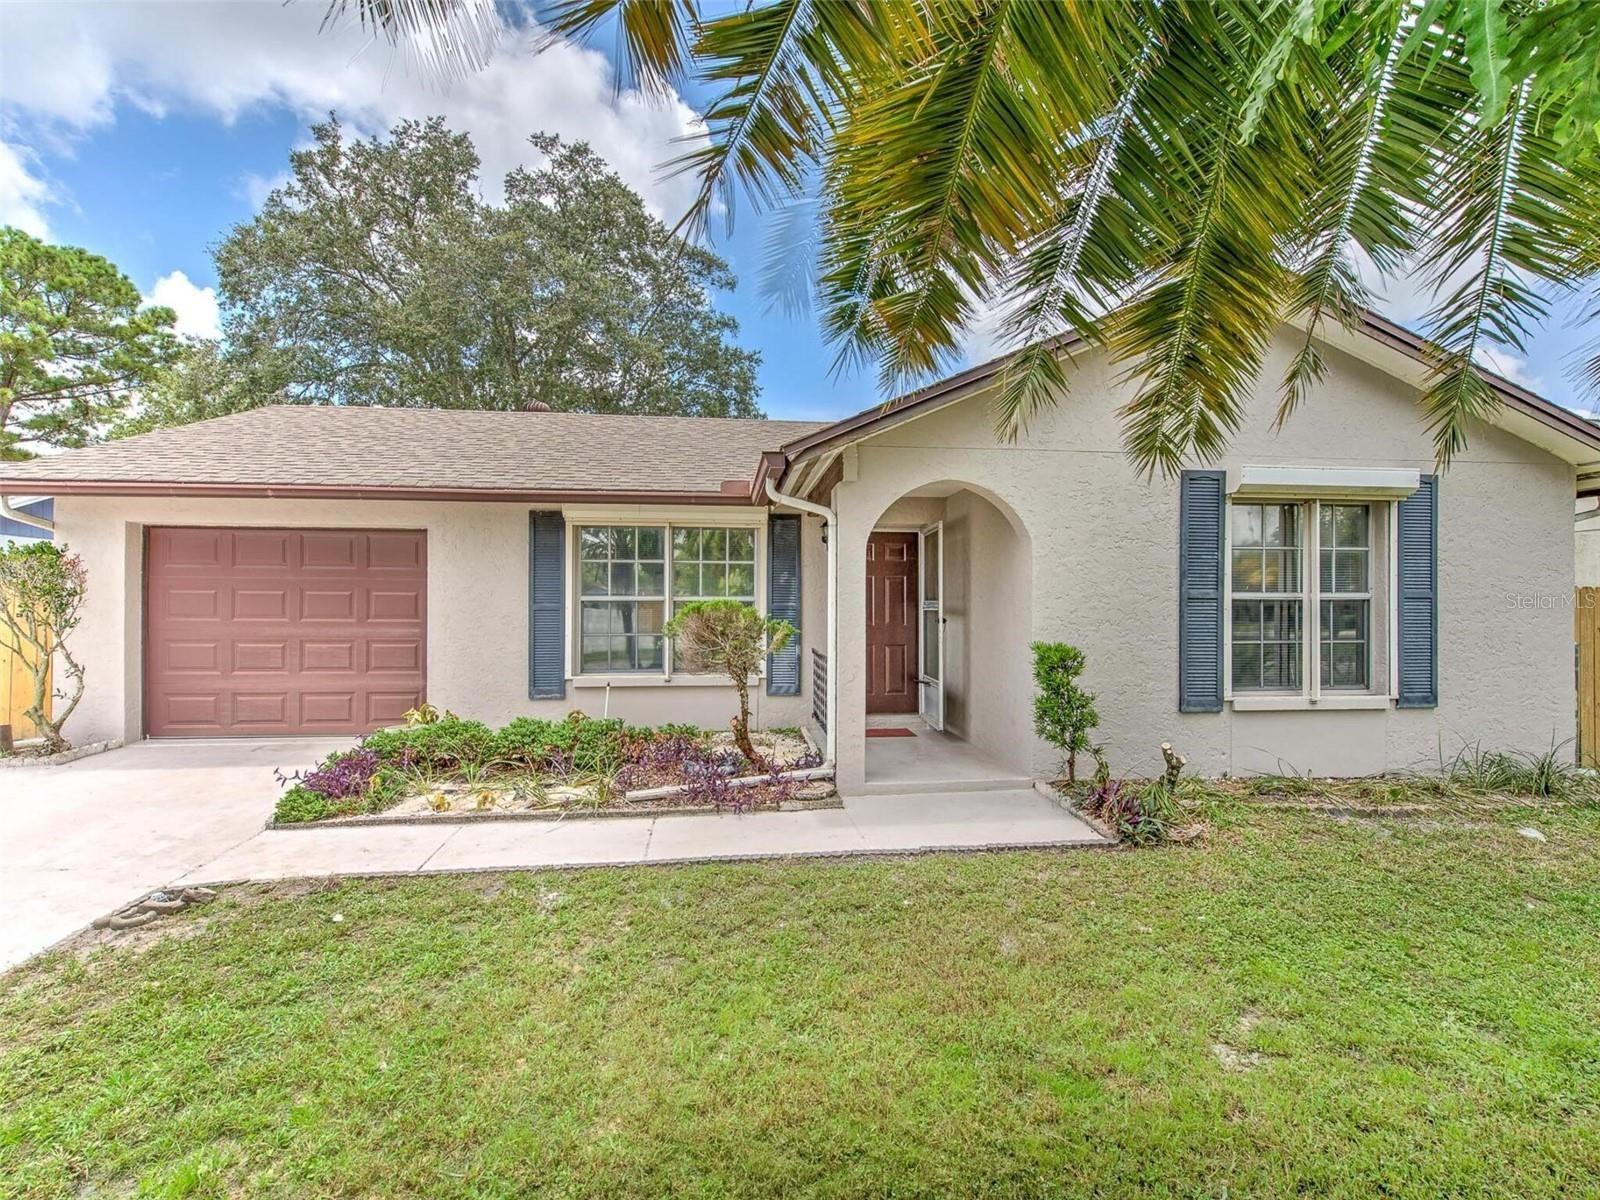 3727 MODESTO STREET, New Port Richey, FL 34655 - MLS#: U8131555